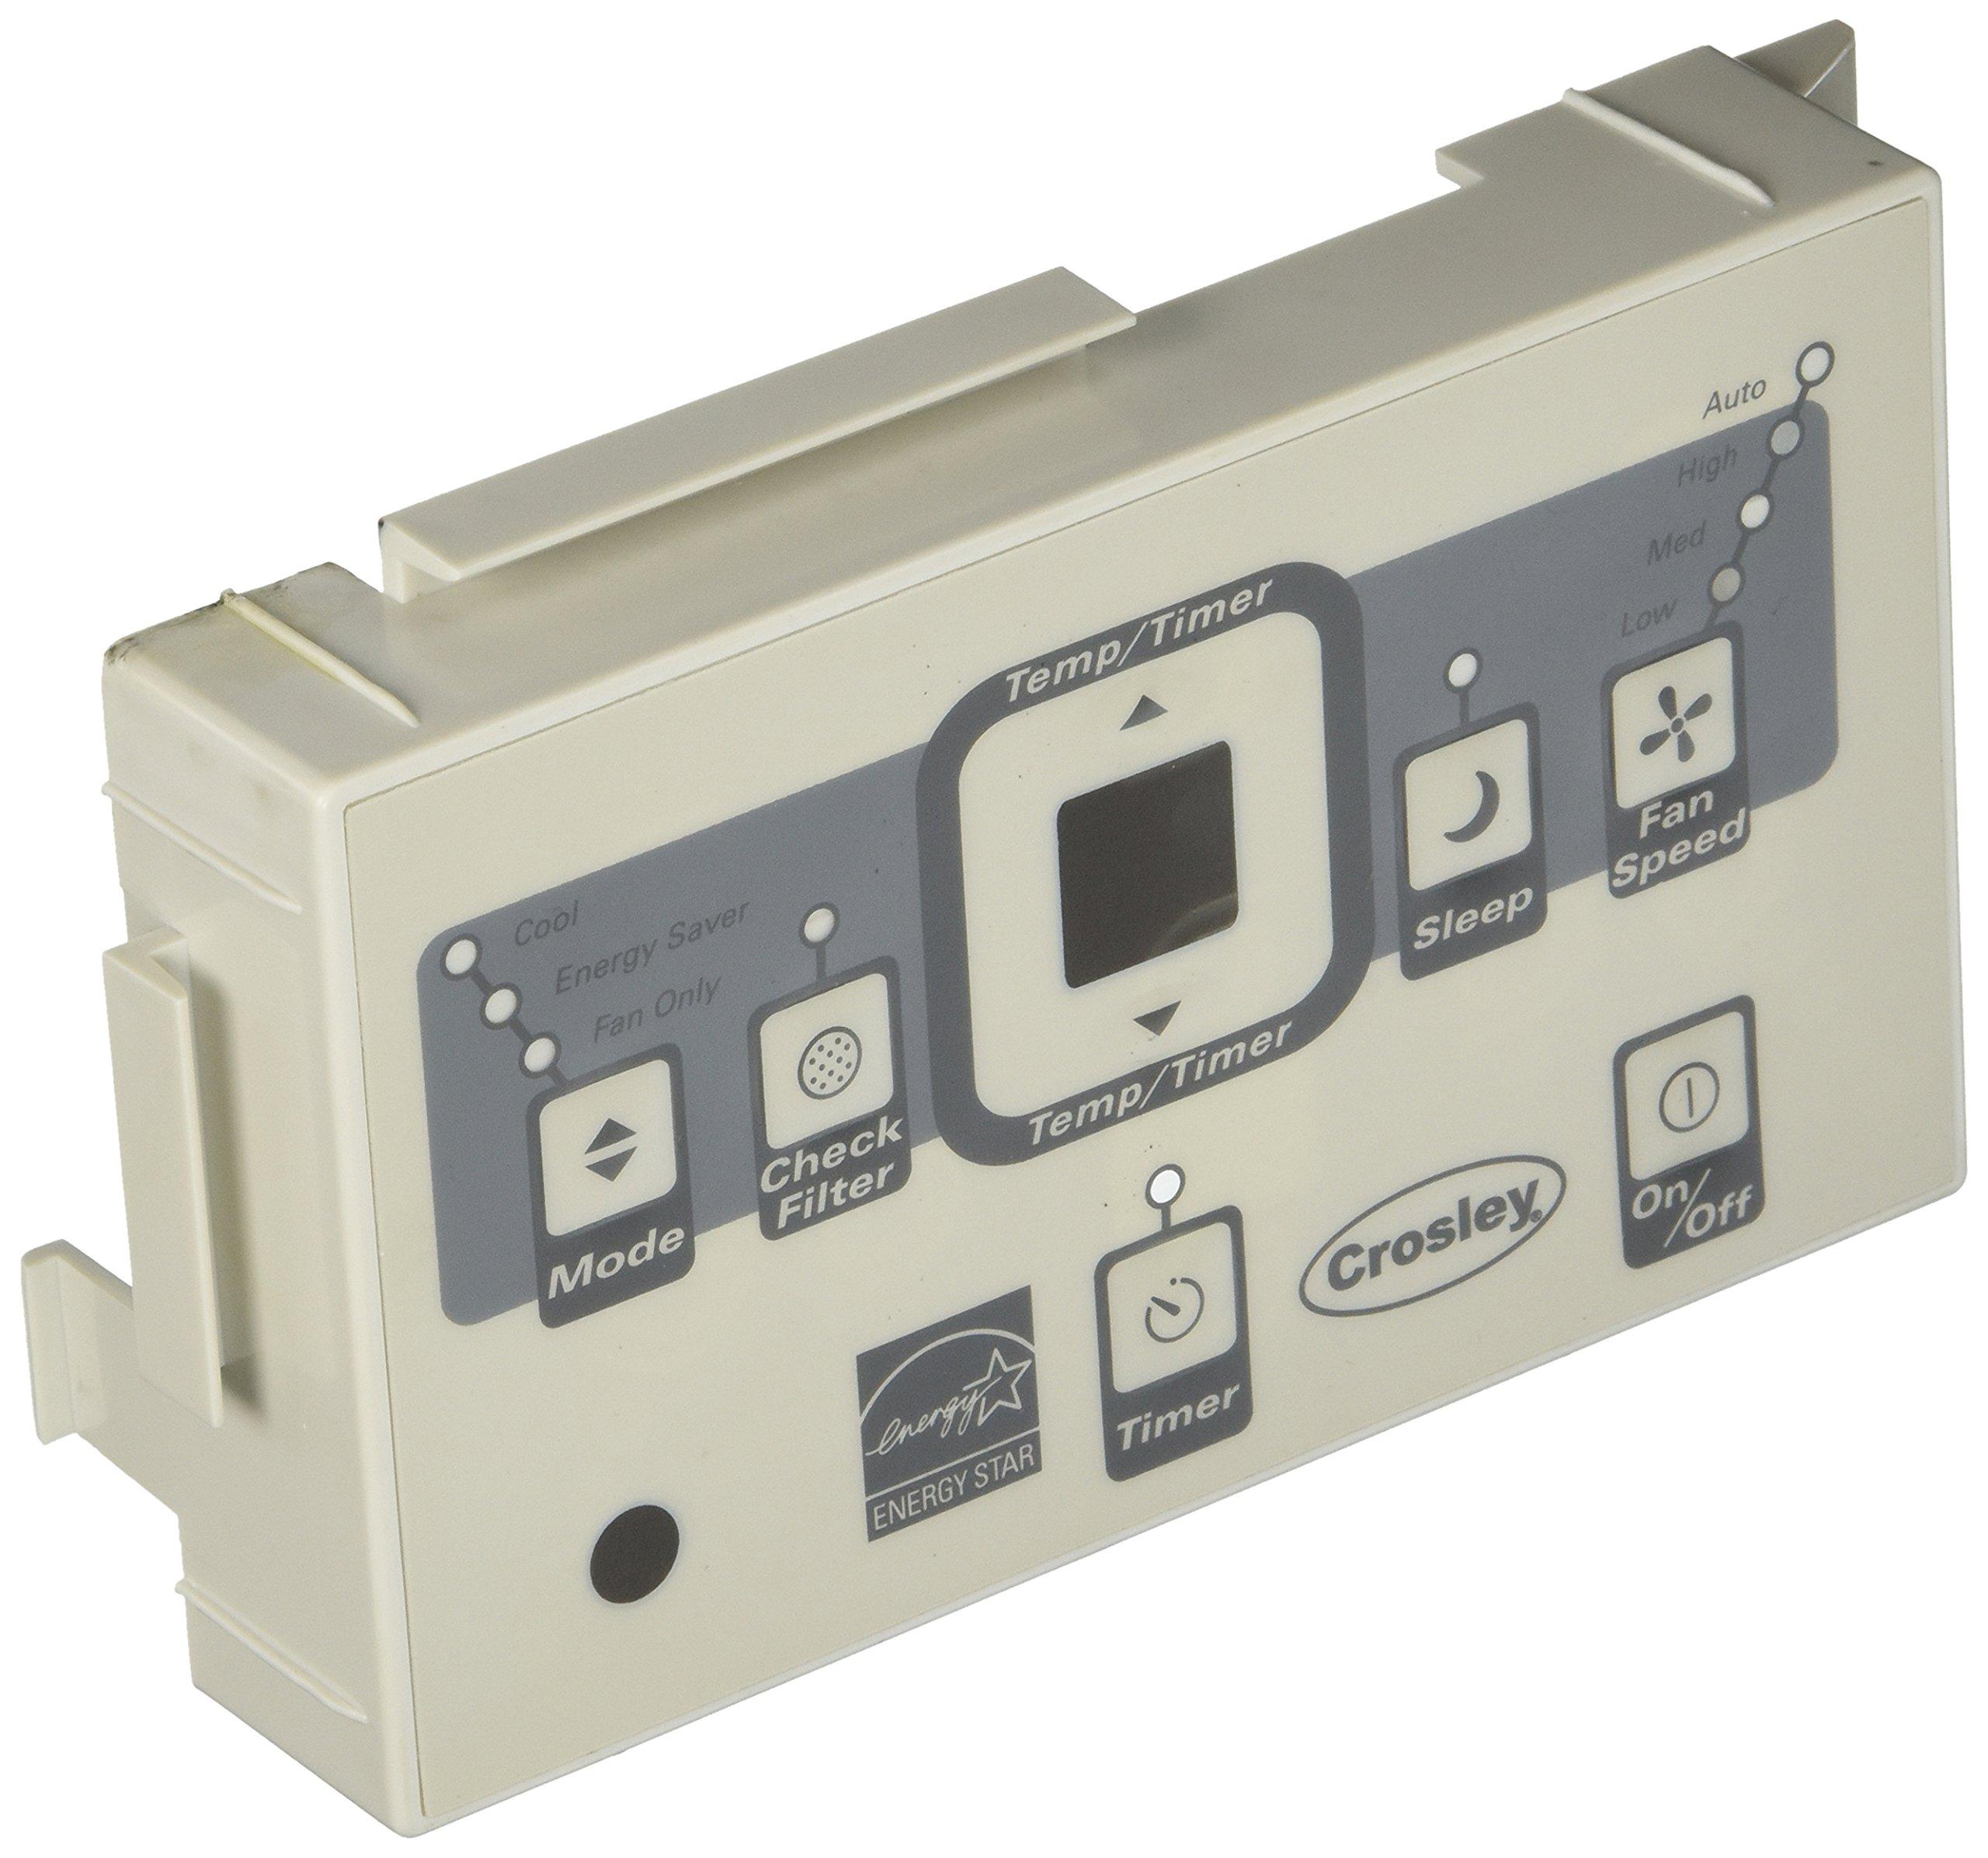 Frigidaire 5304472428 Air Conditioner Control Panel by Frigidaire